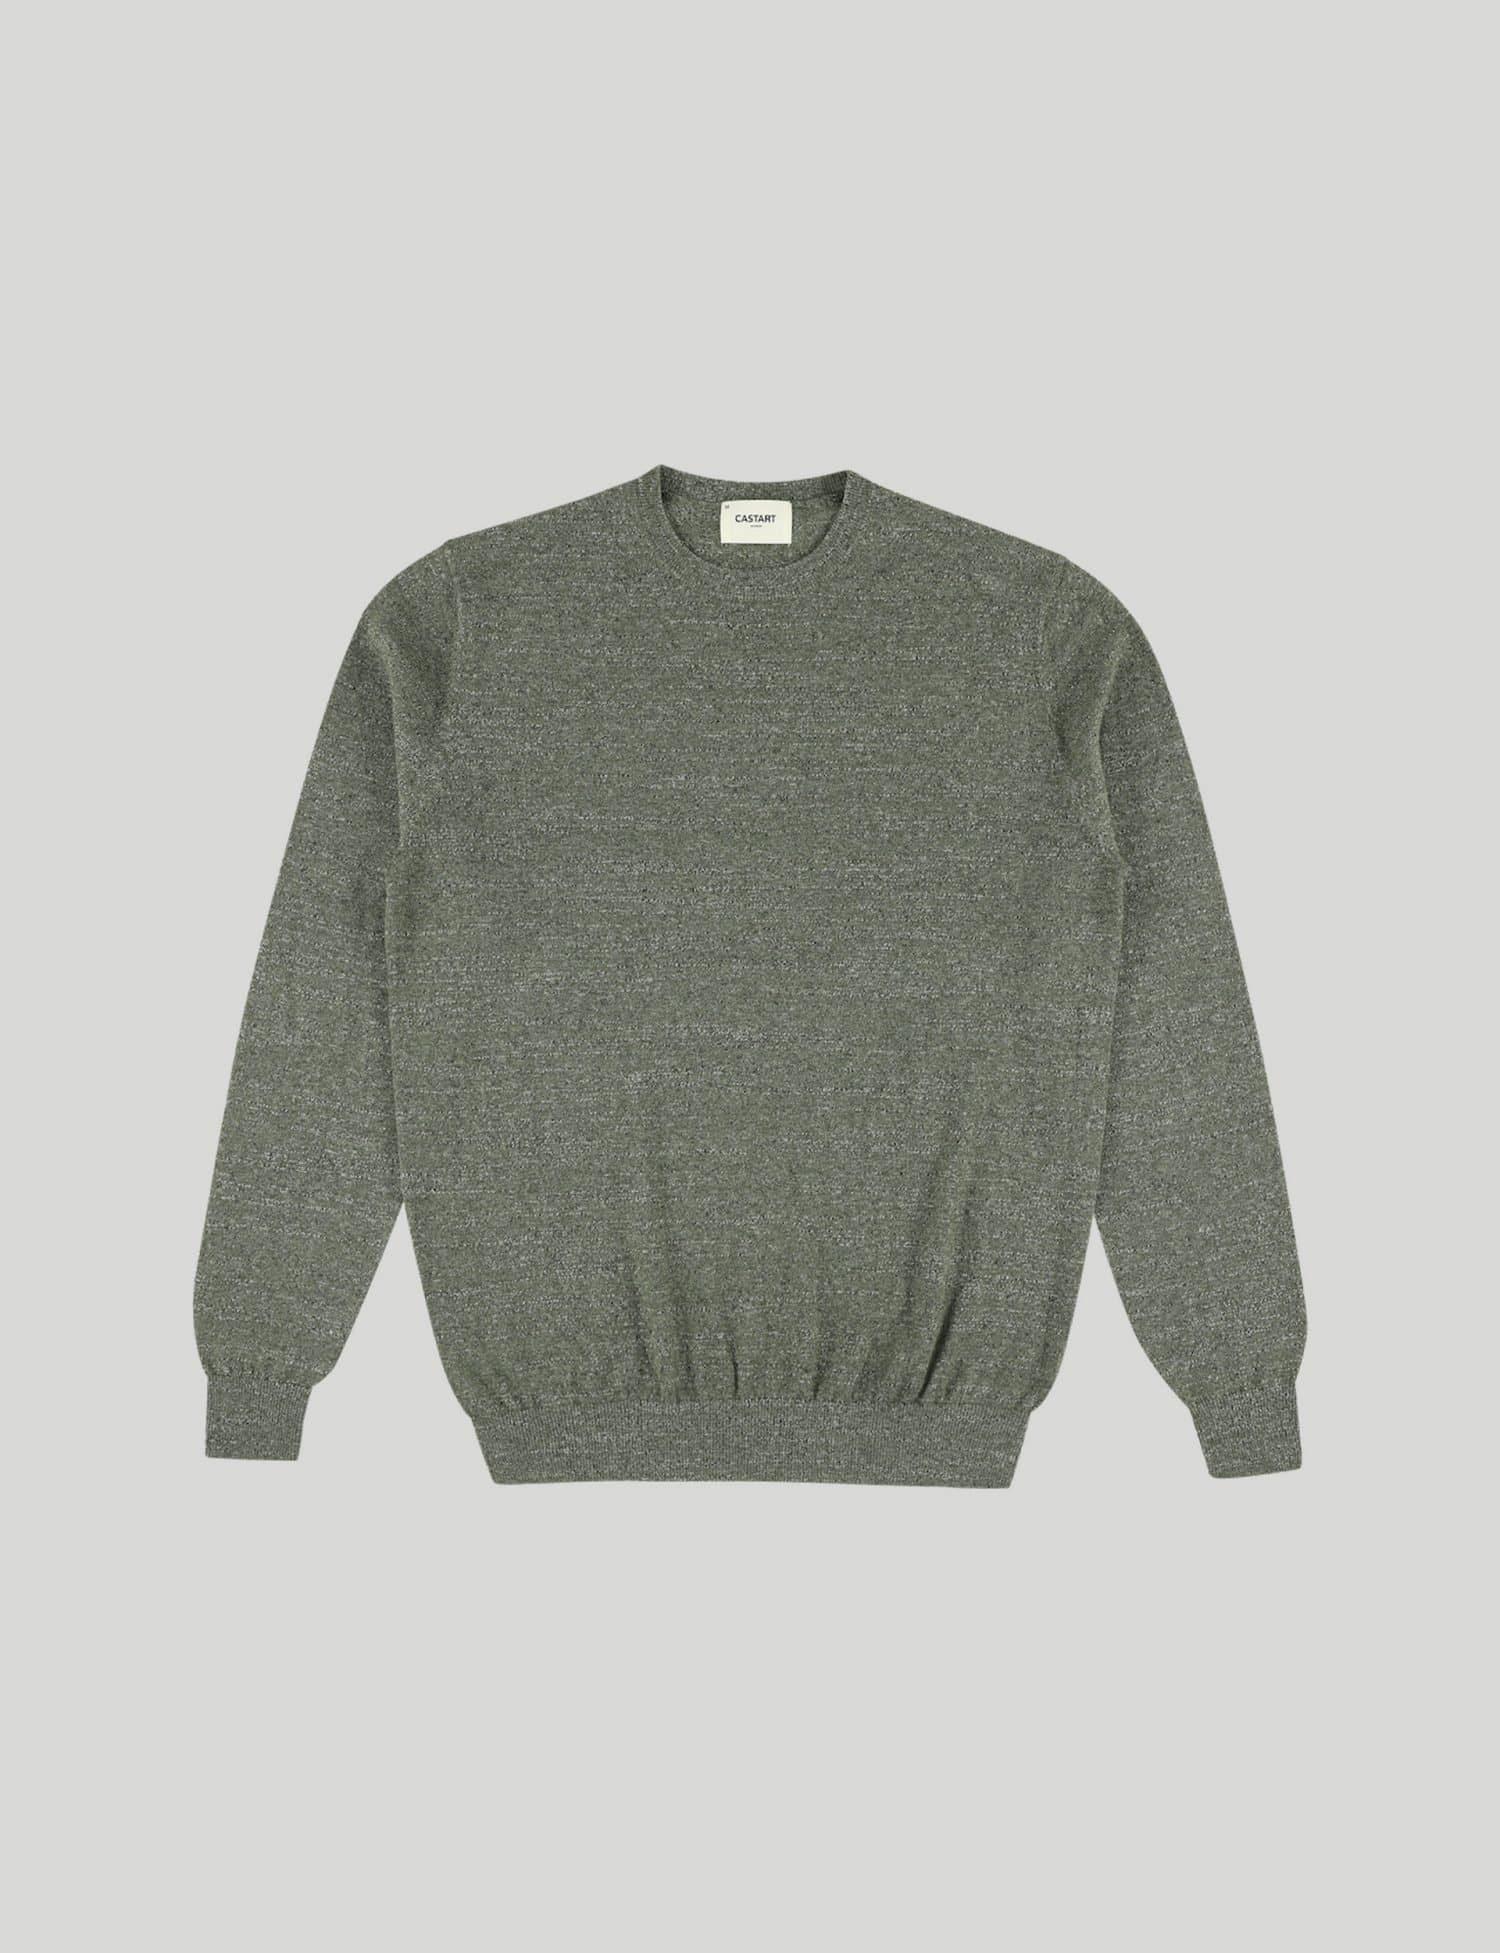 Castart - Heckel Knitwear - Khaki